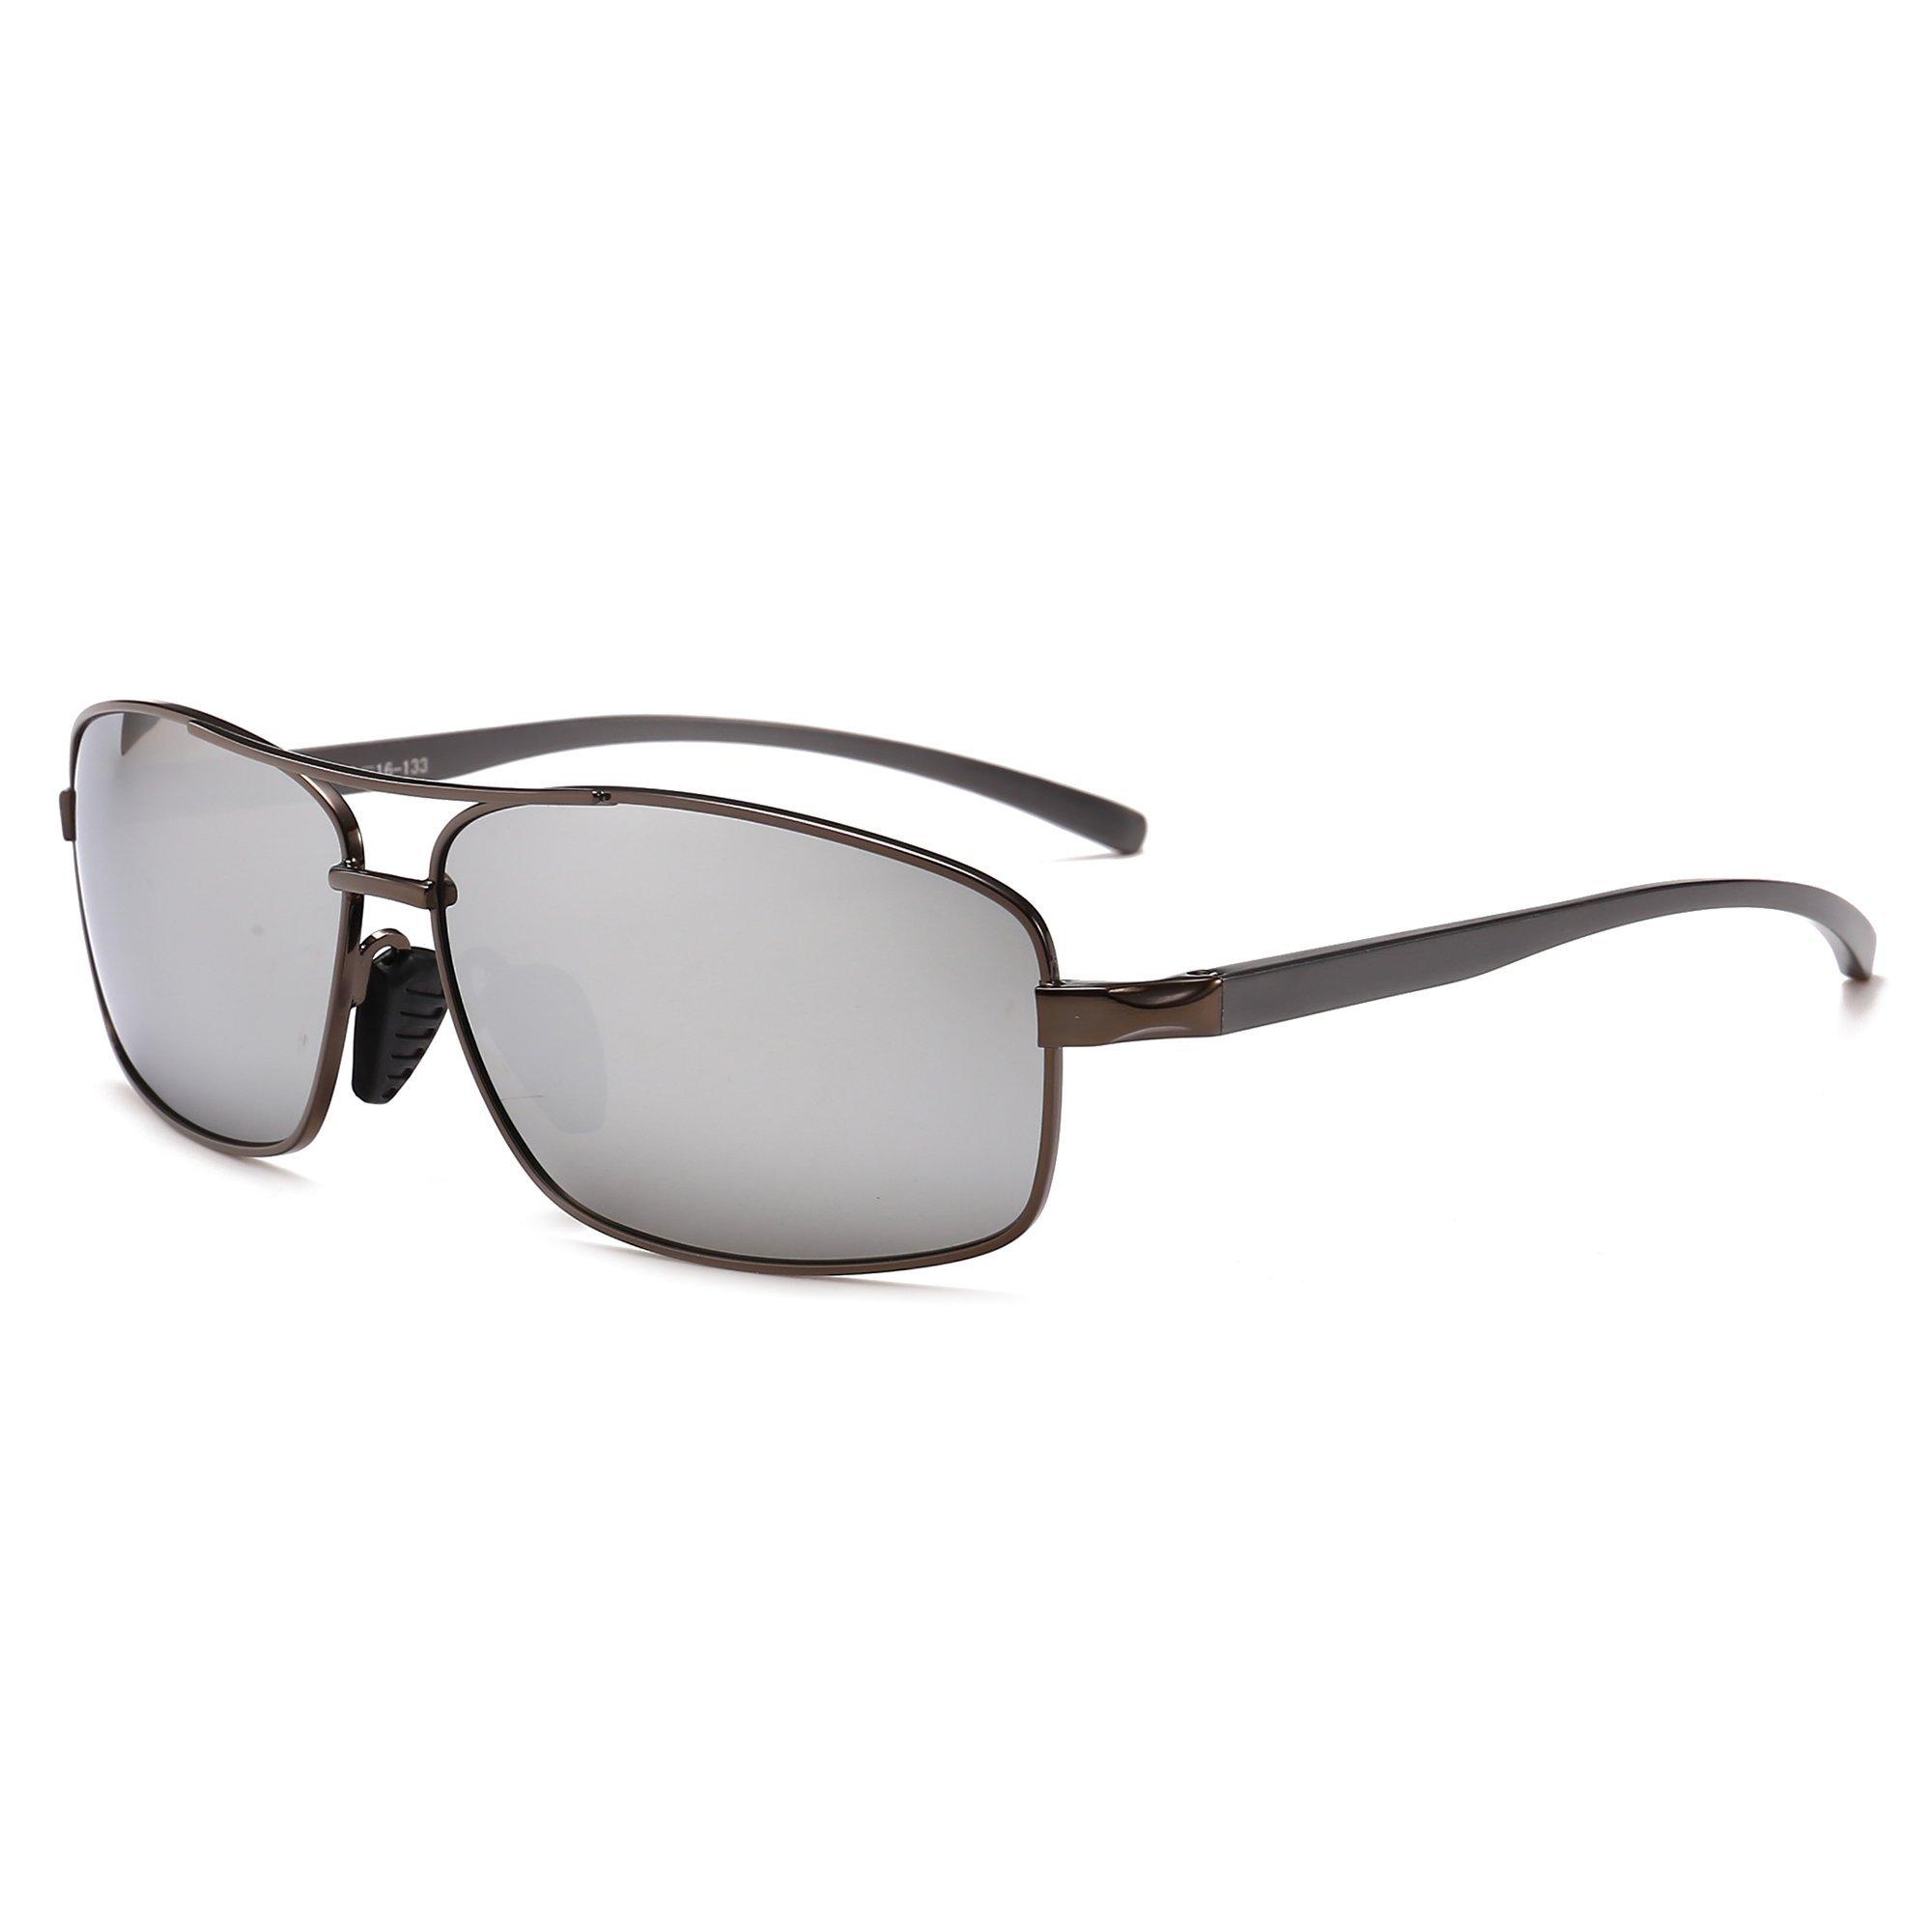 SUNGAIT Ultra Lightweight Rectangular Polarized Sunglasses 100% UV protection (Gunmetal Frame Sliver Mirror Lens, 62) Metal Frame 2458QKSY